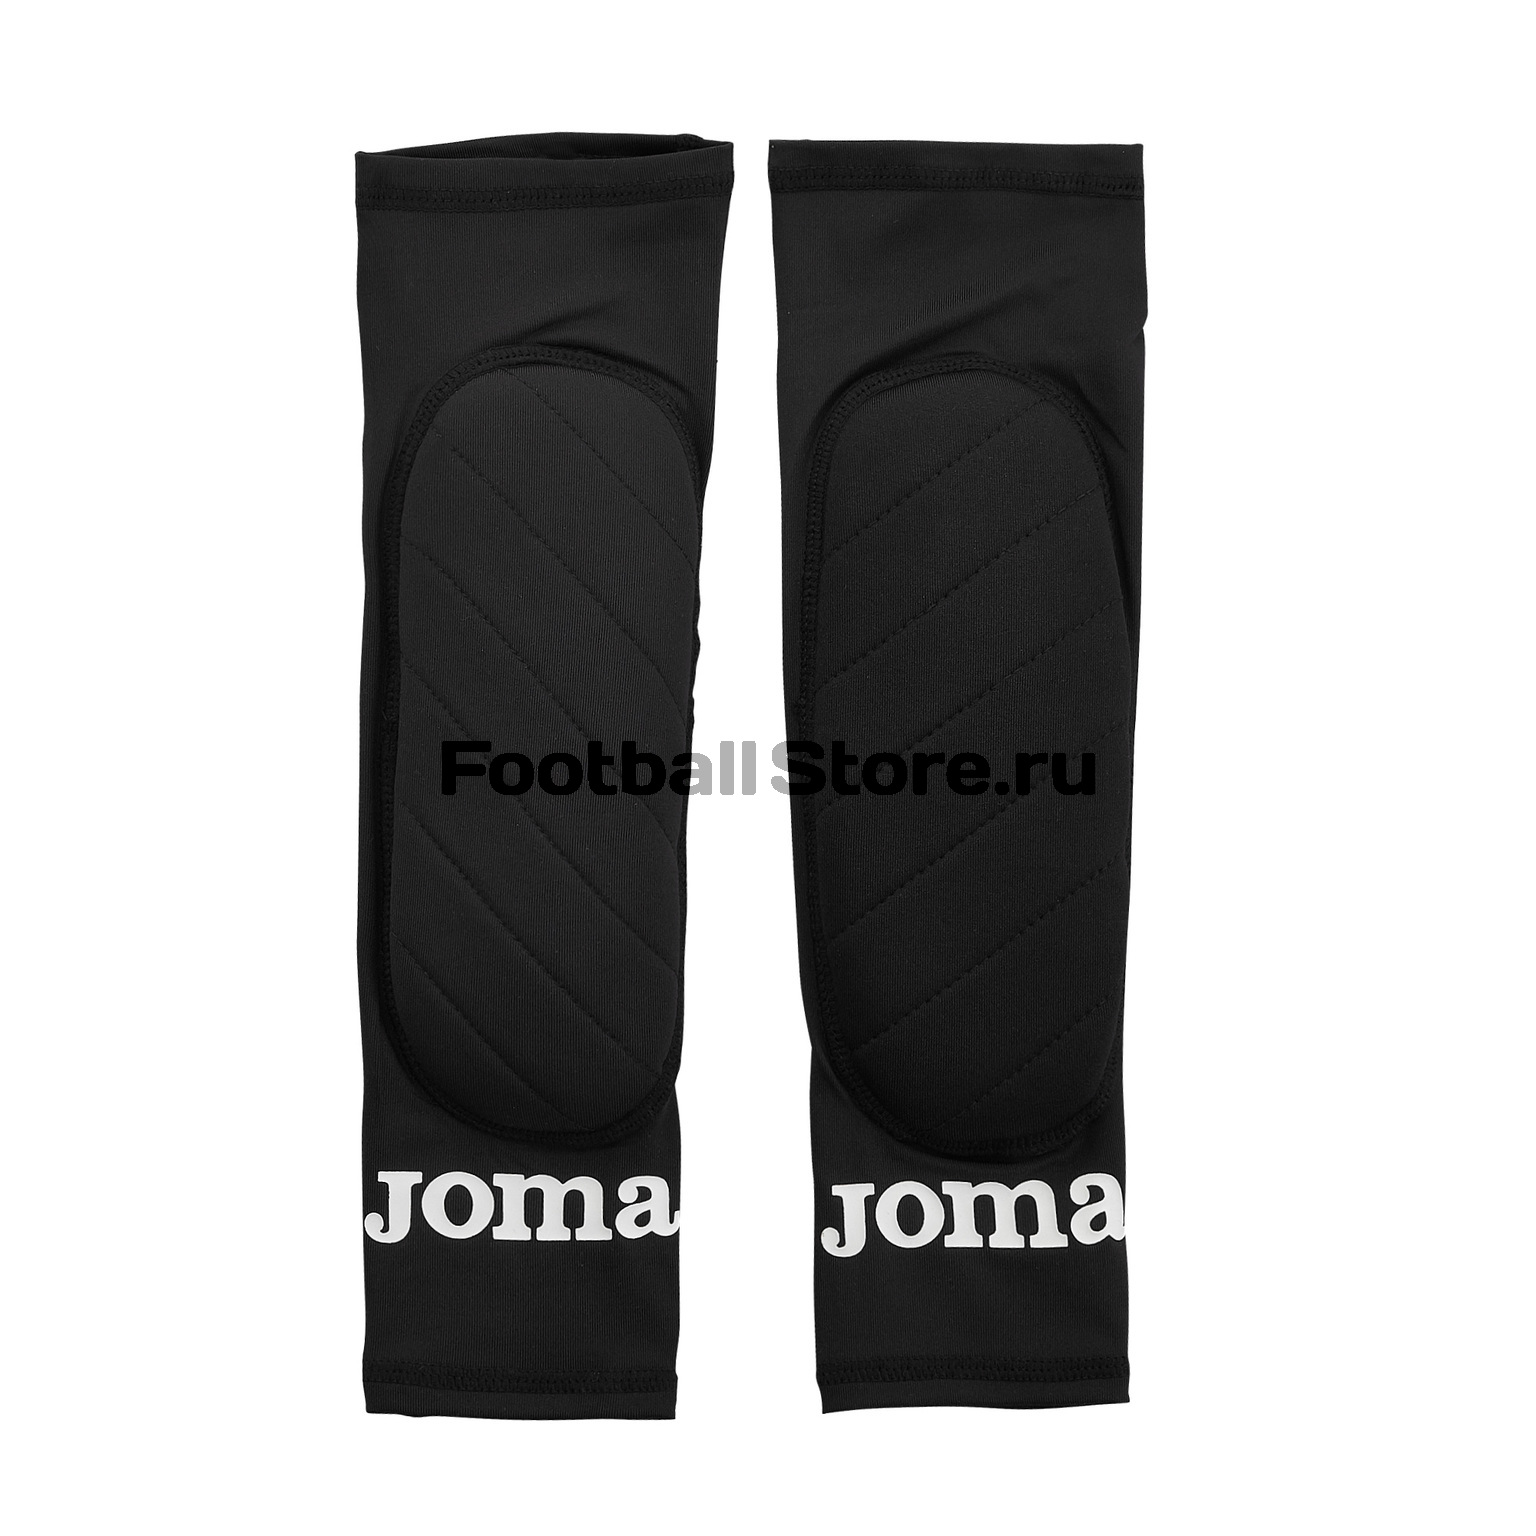 Нарукавник вратарский Joma 400094.100